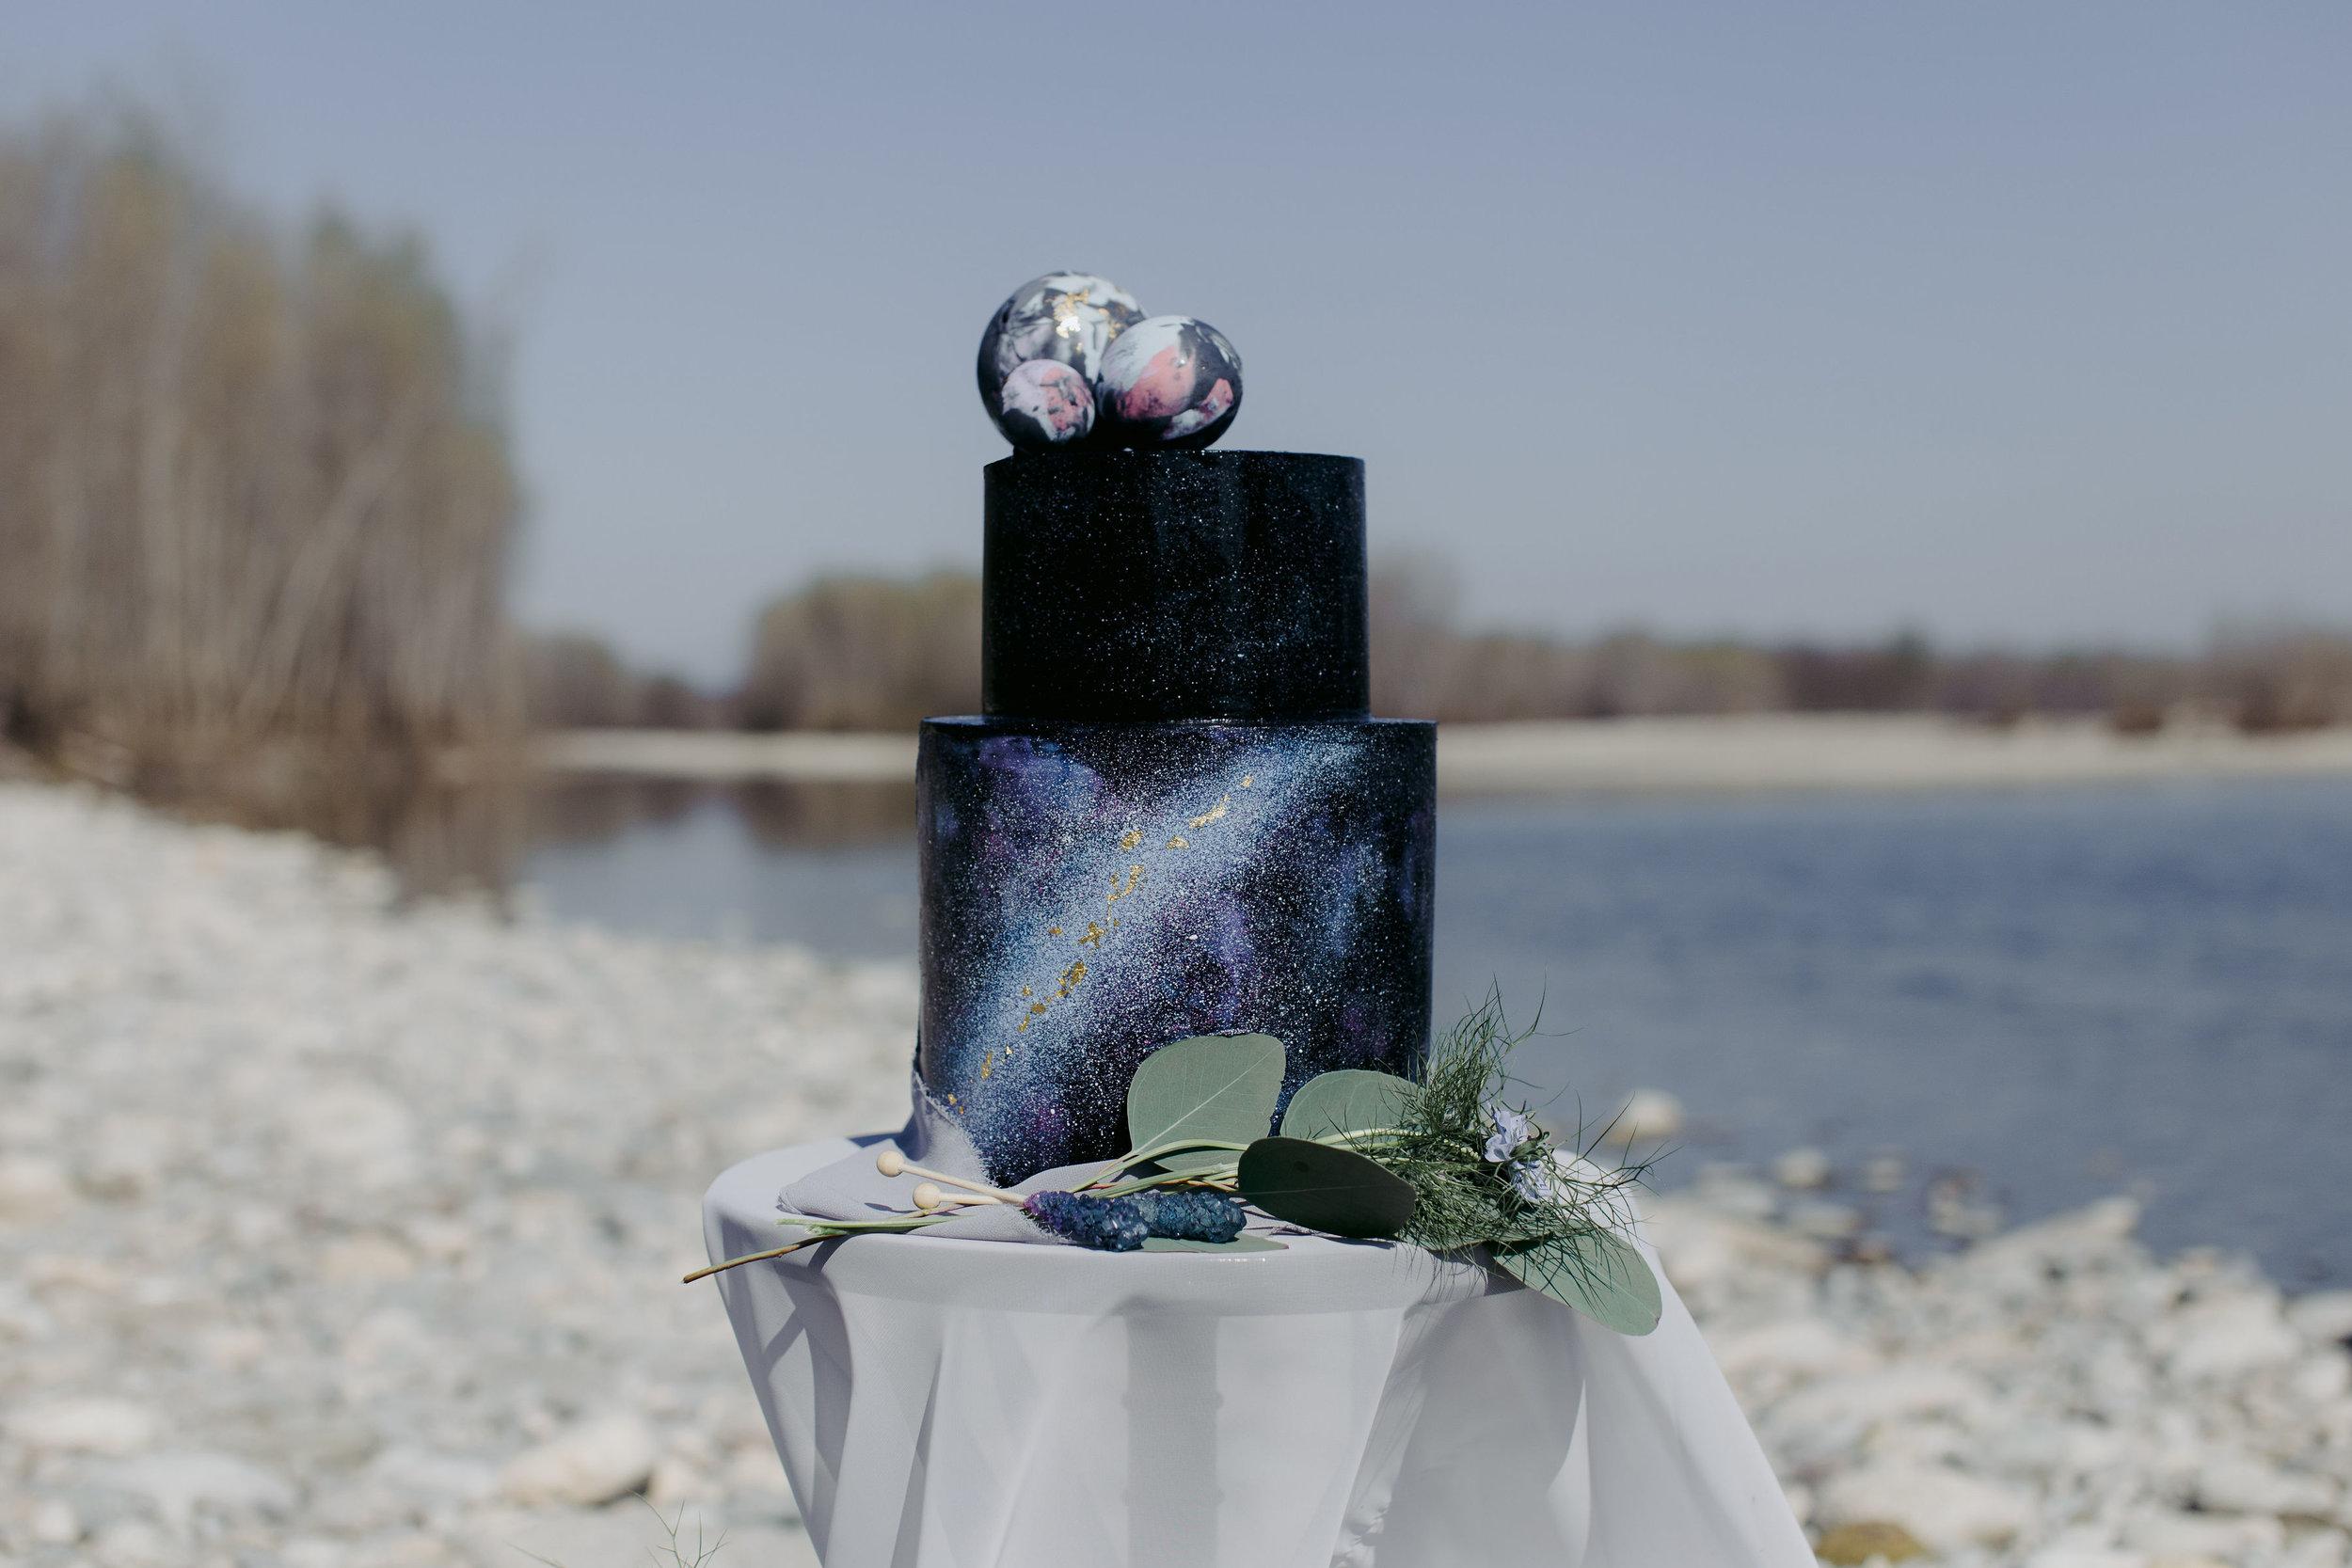 004-Cosmos.JPG